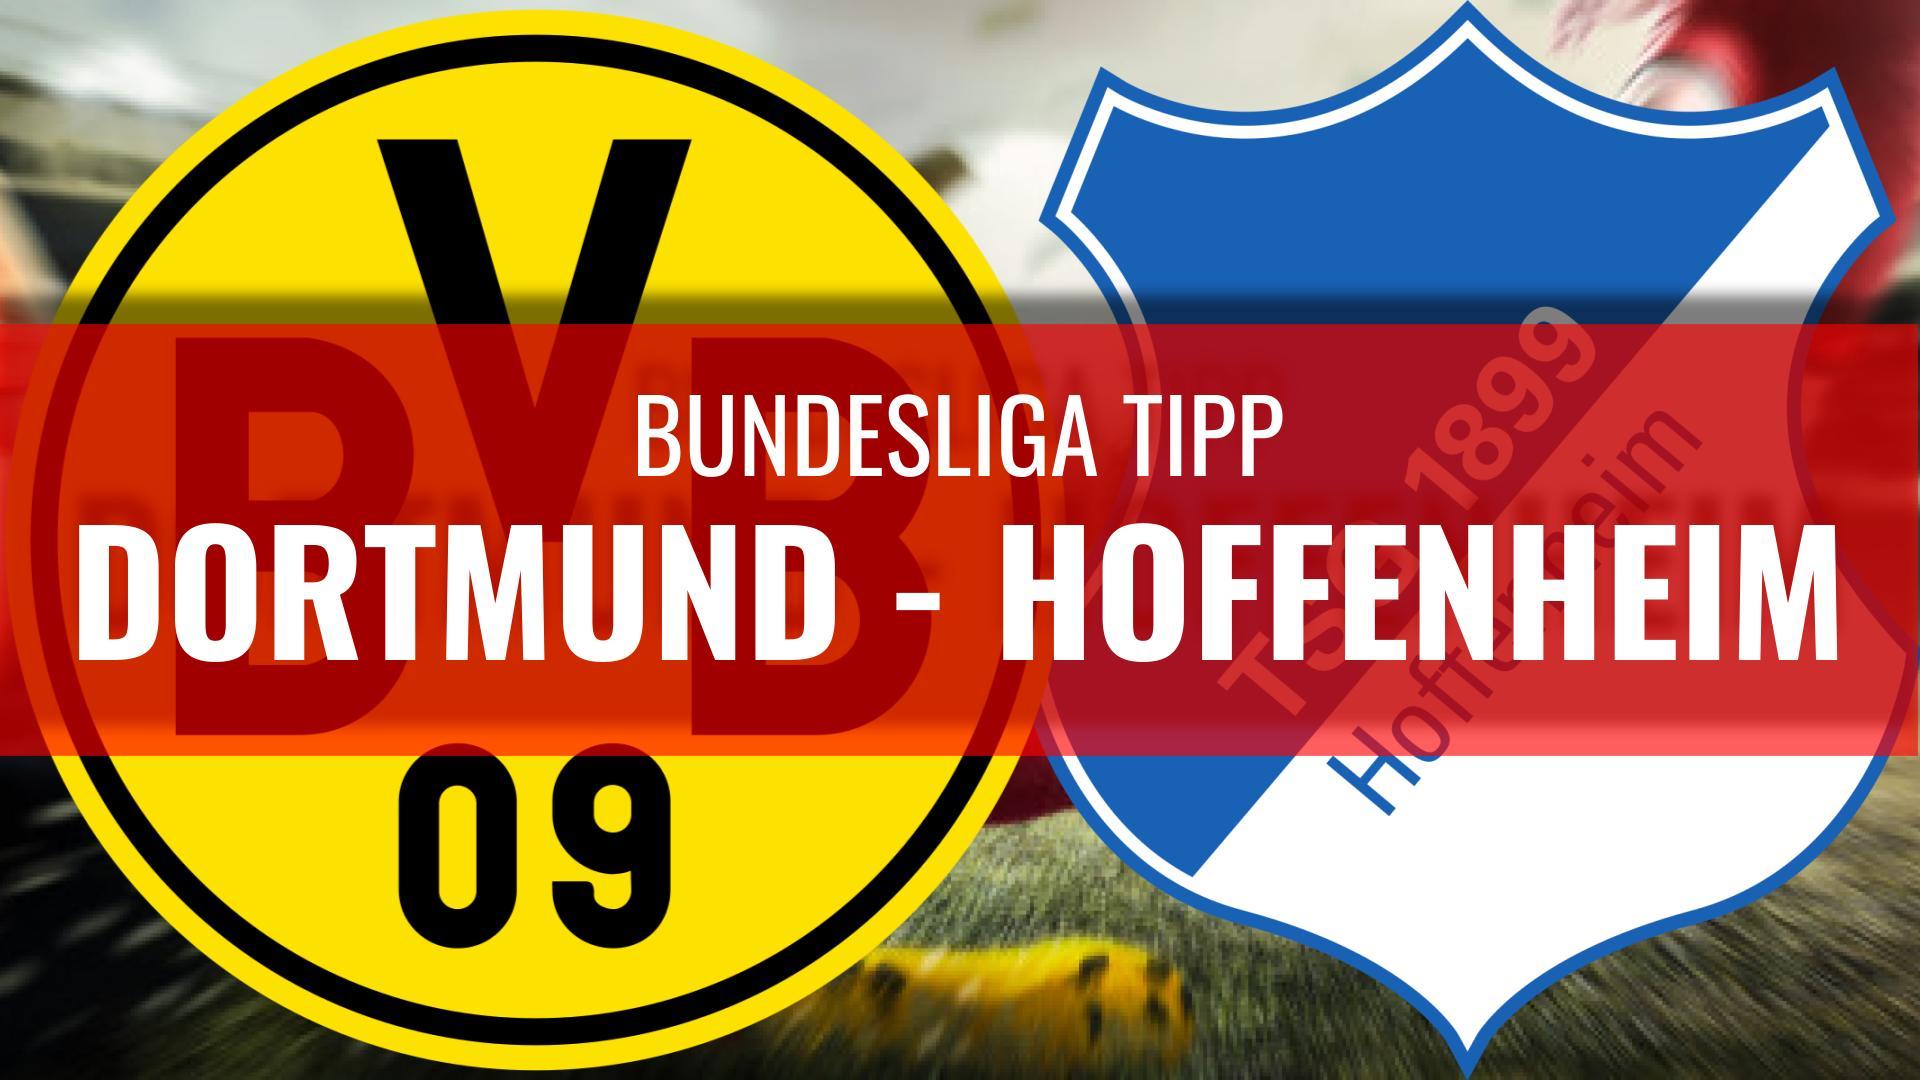 DORTMUND - HOFFENHEIM-Bundesliga-Wett-Tipps